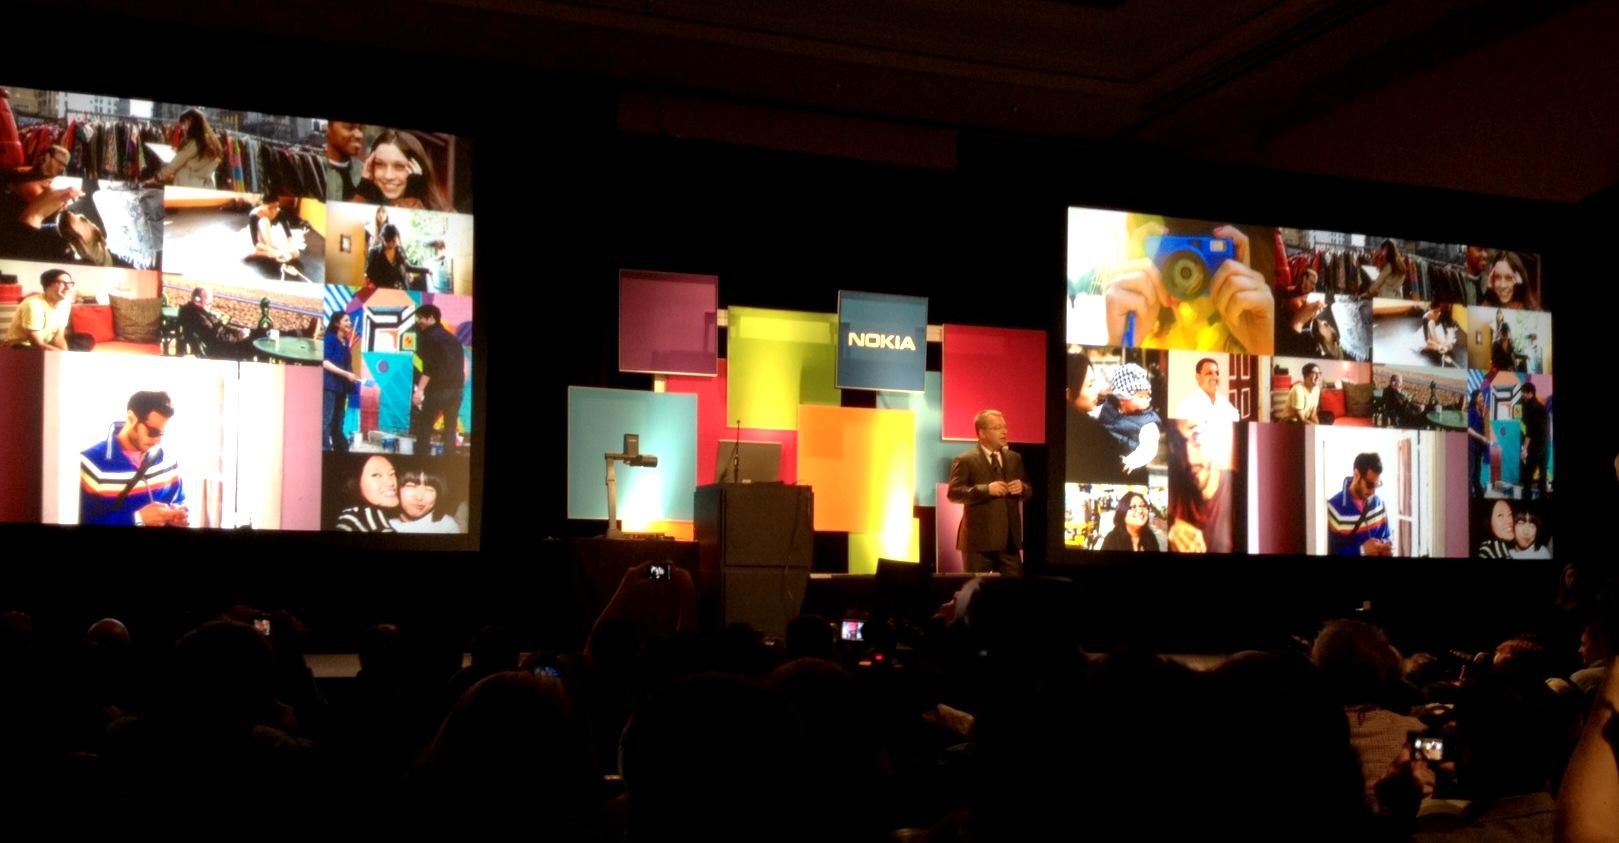 Elop na conferência da Nokia (Foto: Nick Ellis/TechTudo)